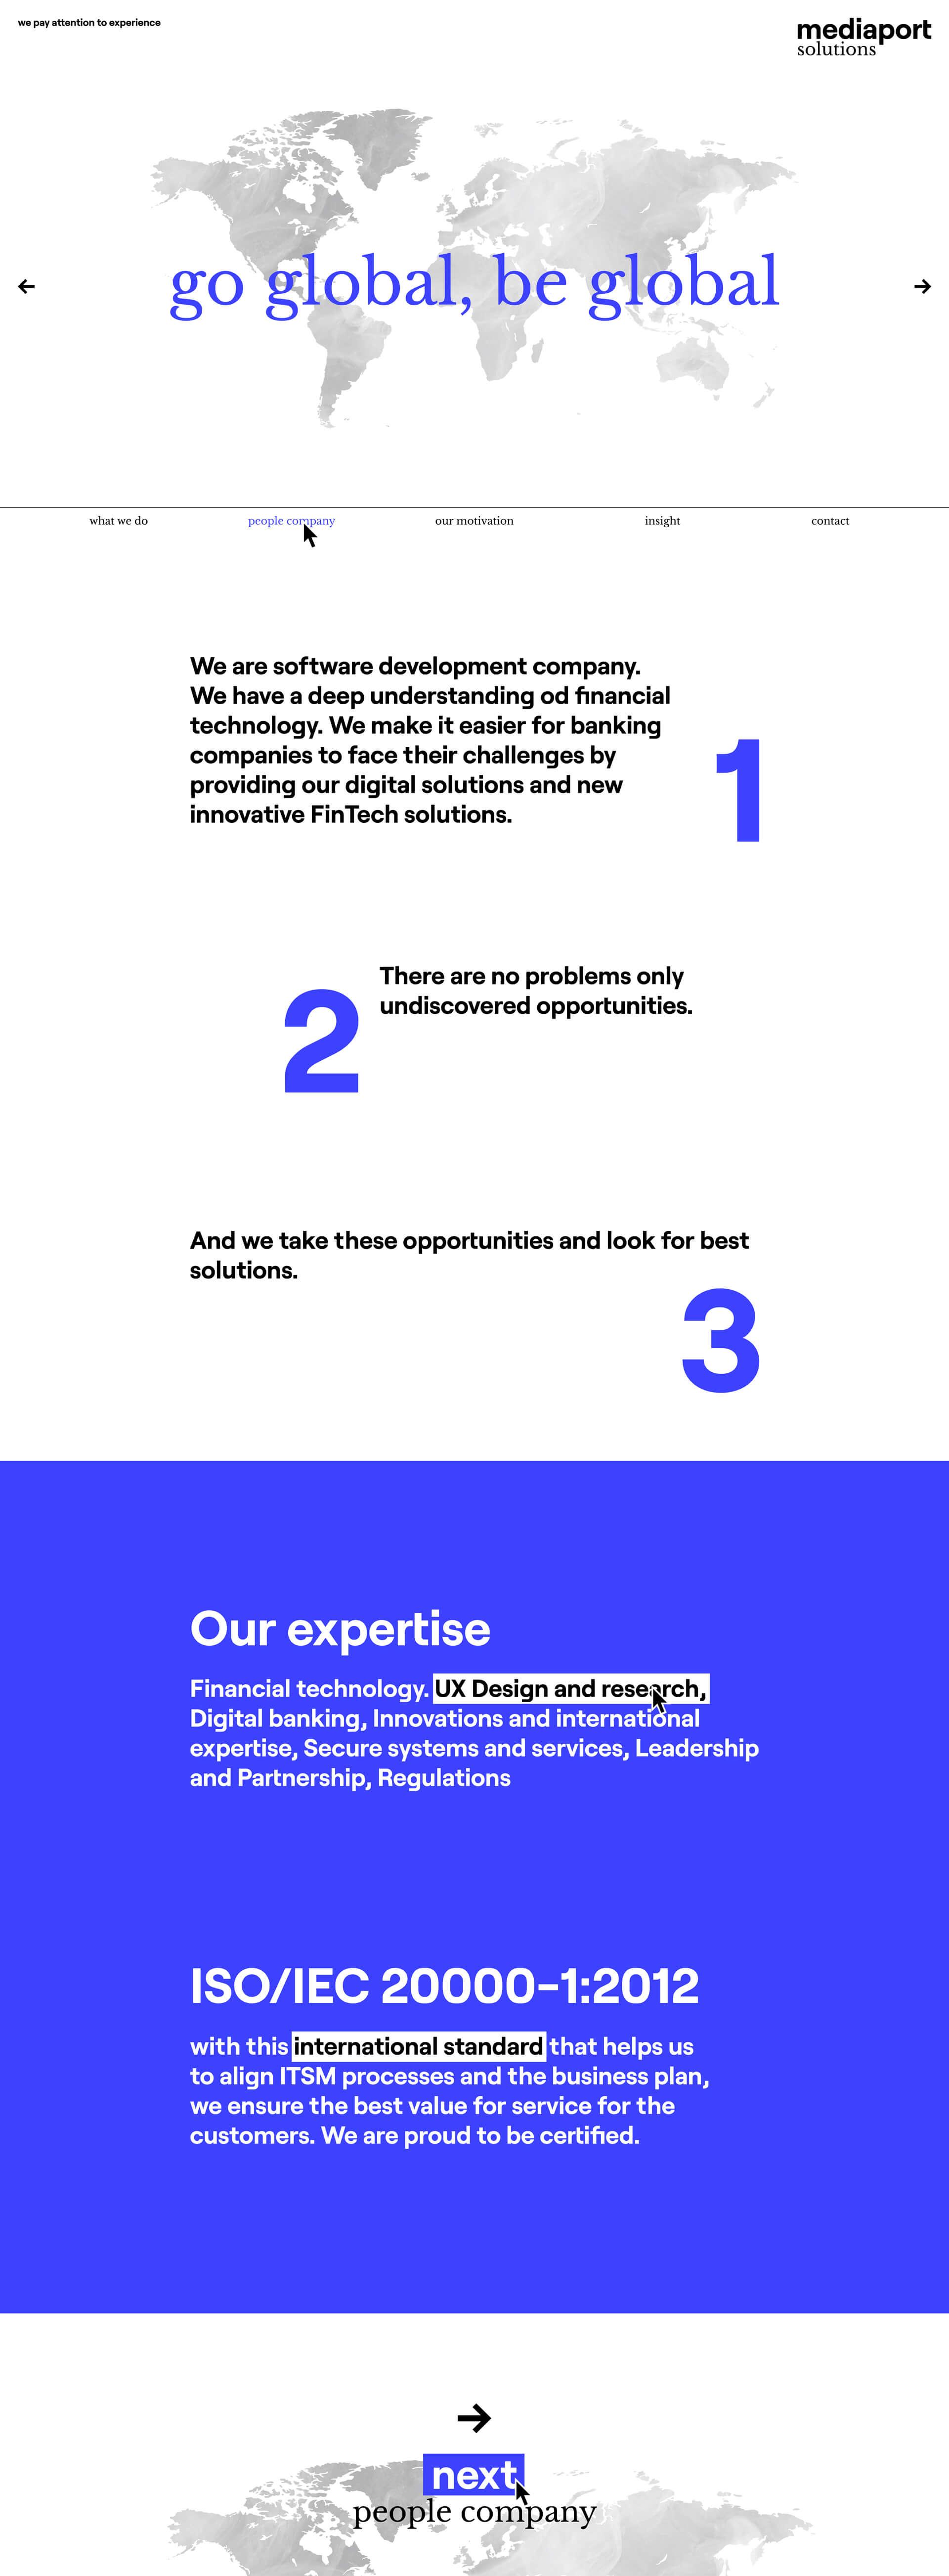 Mediaport solutions - realizace, Webdesign